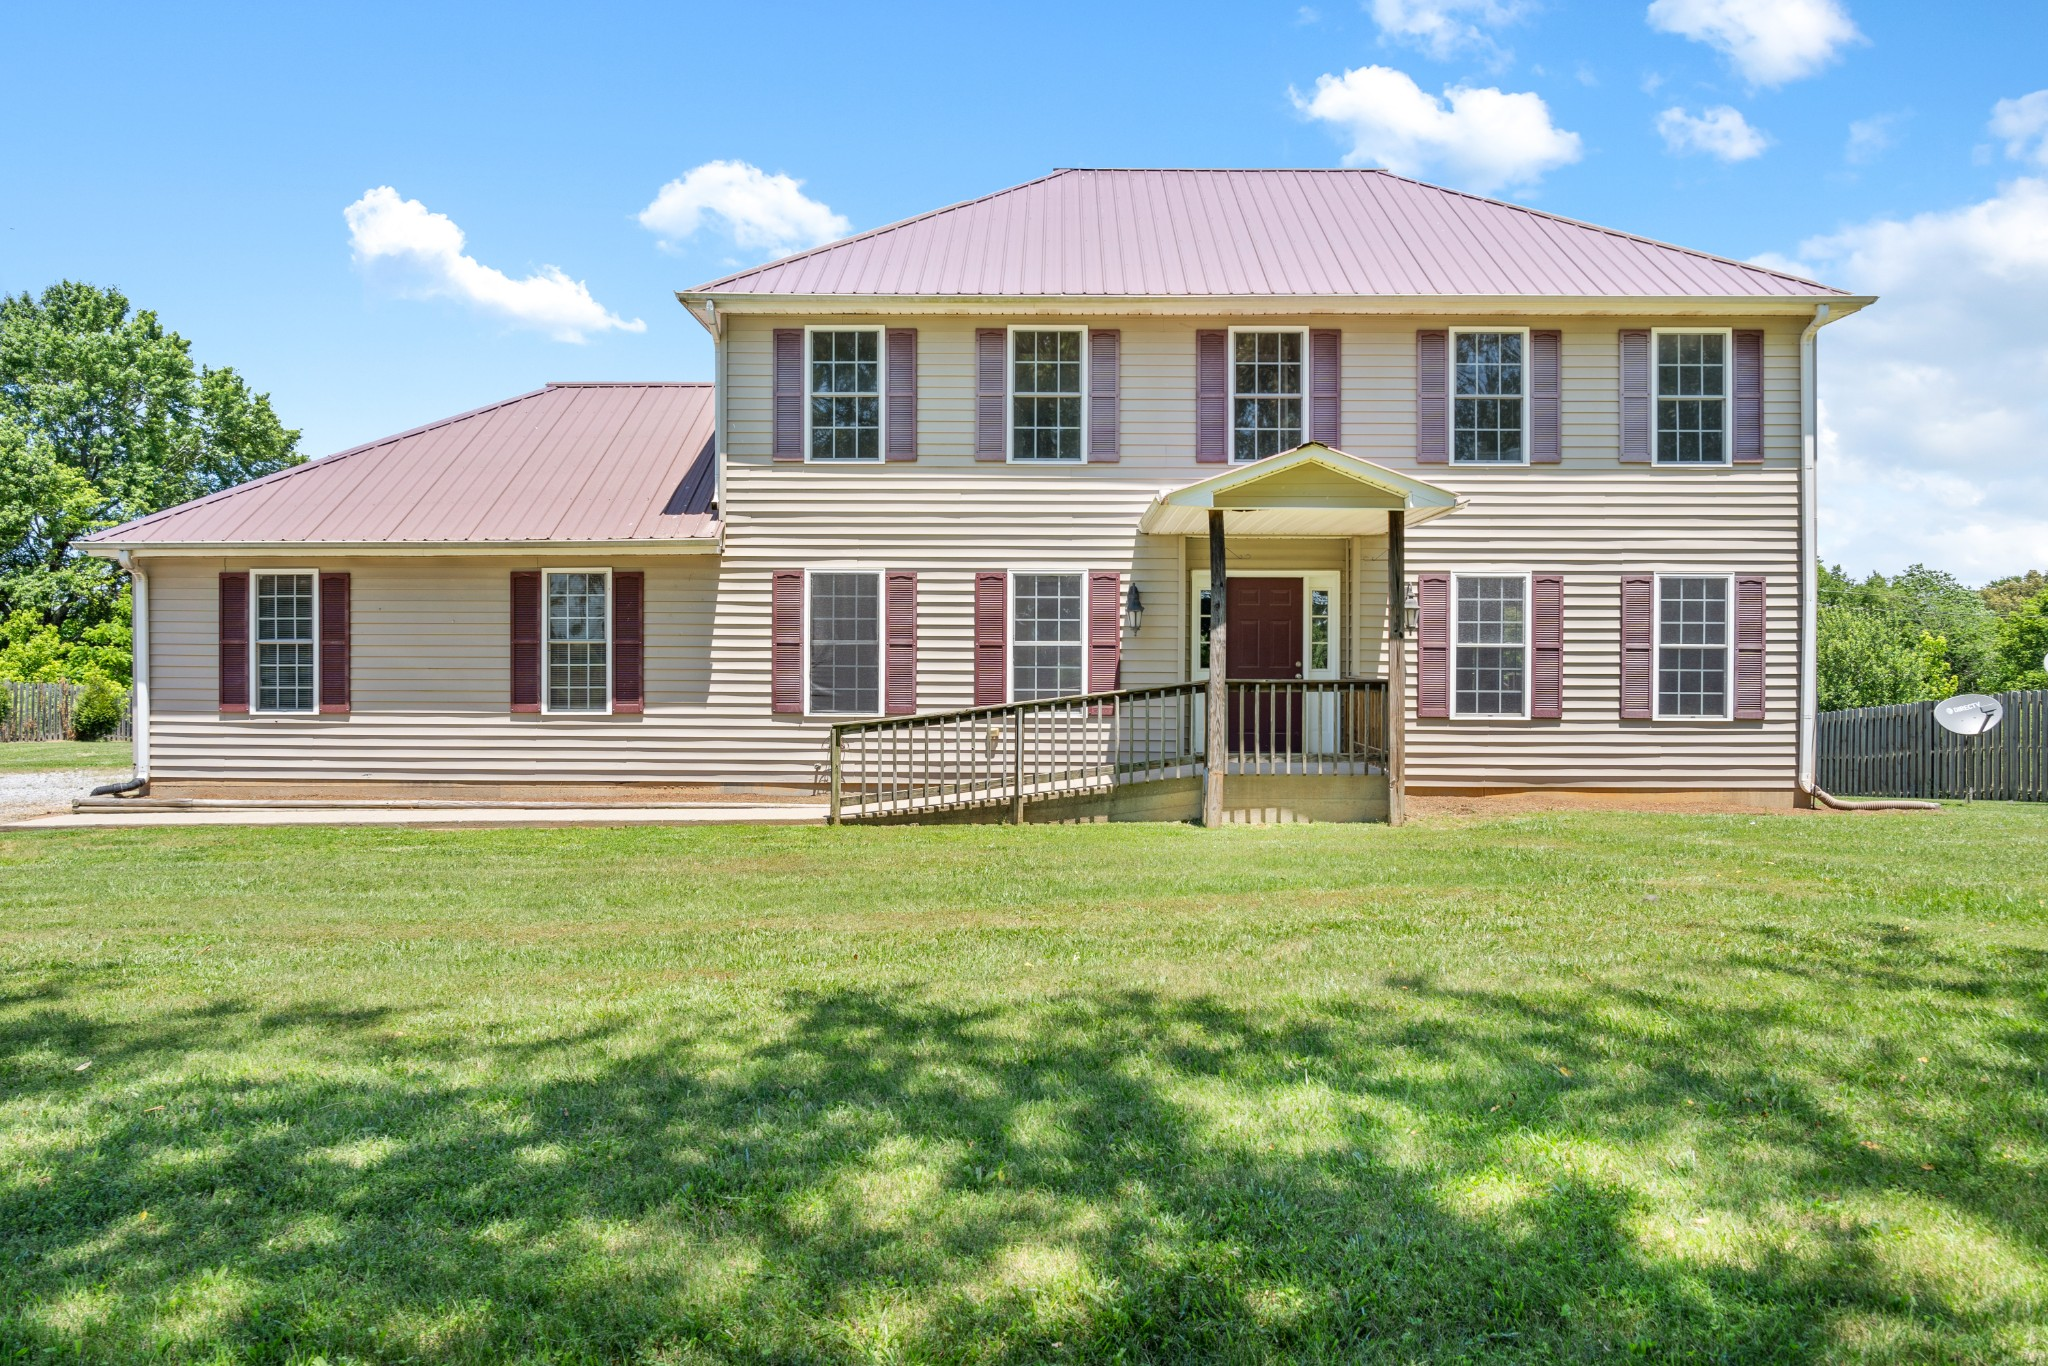 2570 Tuggle Rd Property Photo - Cadiz, KY real estate listing